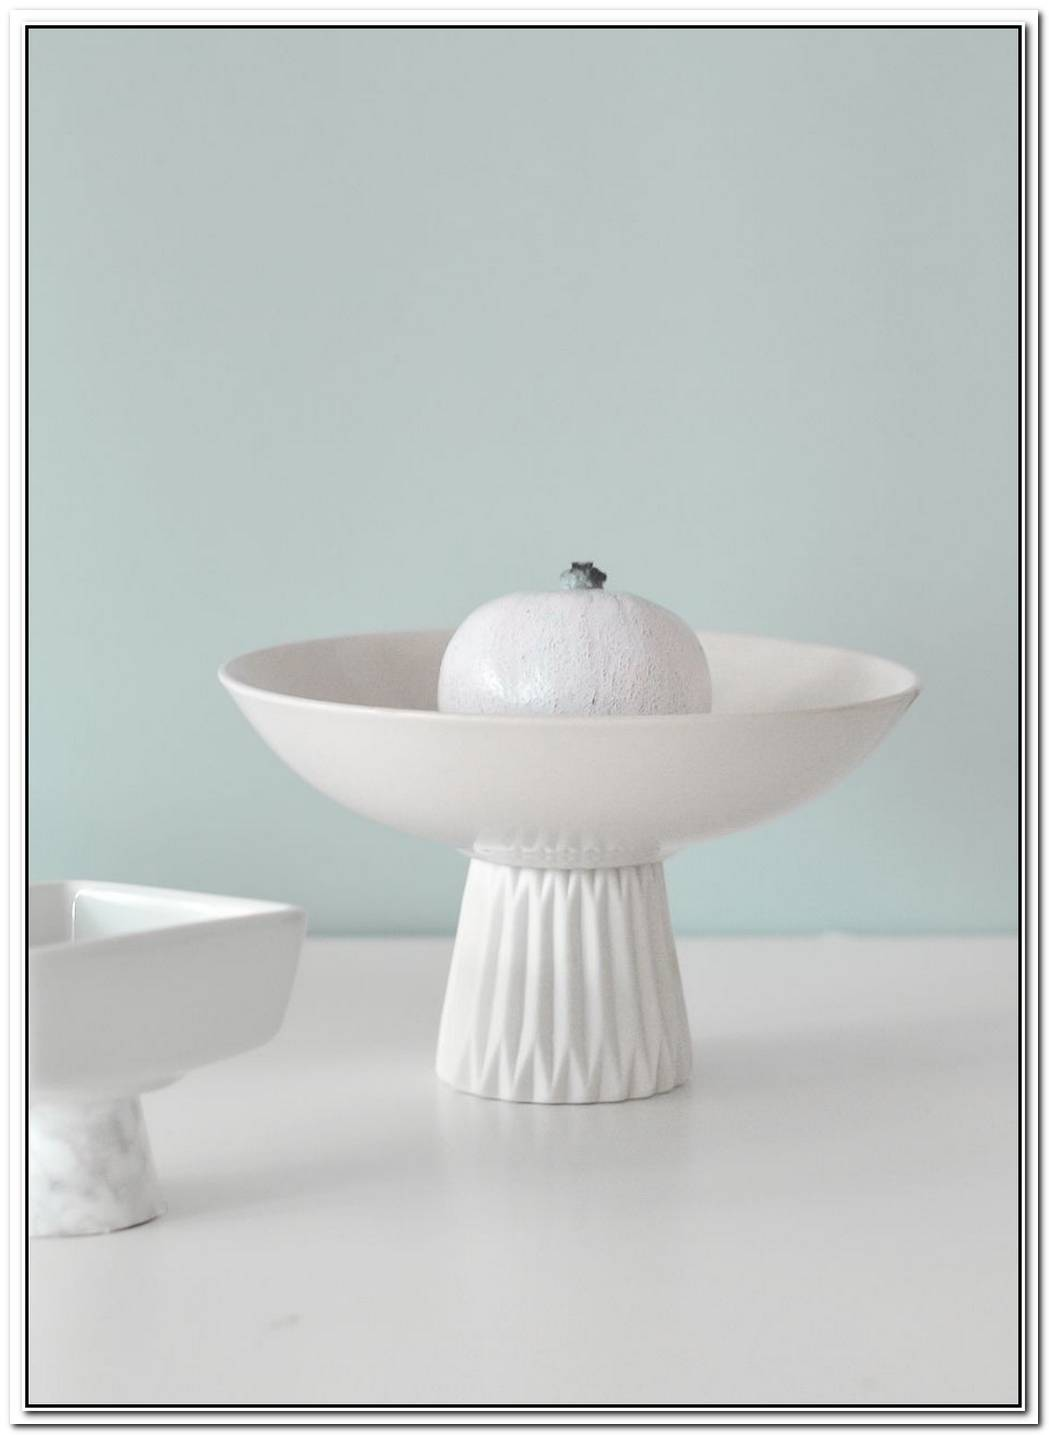 Make Unique Design Serving Plates With This Quick Trick